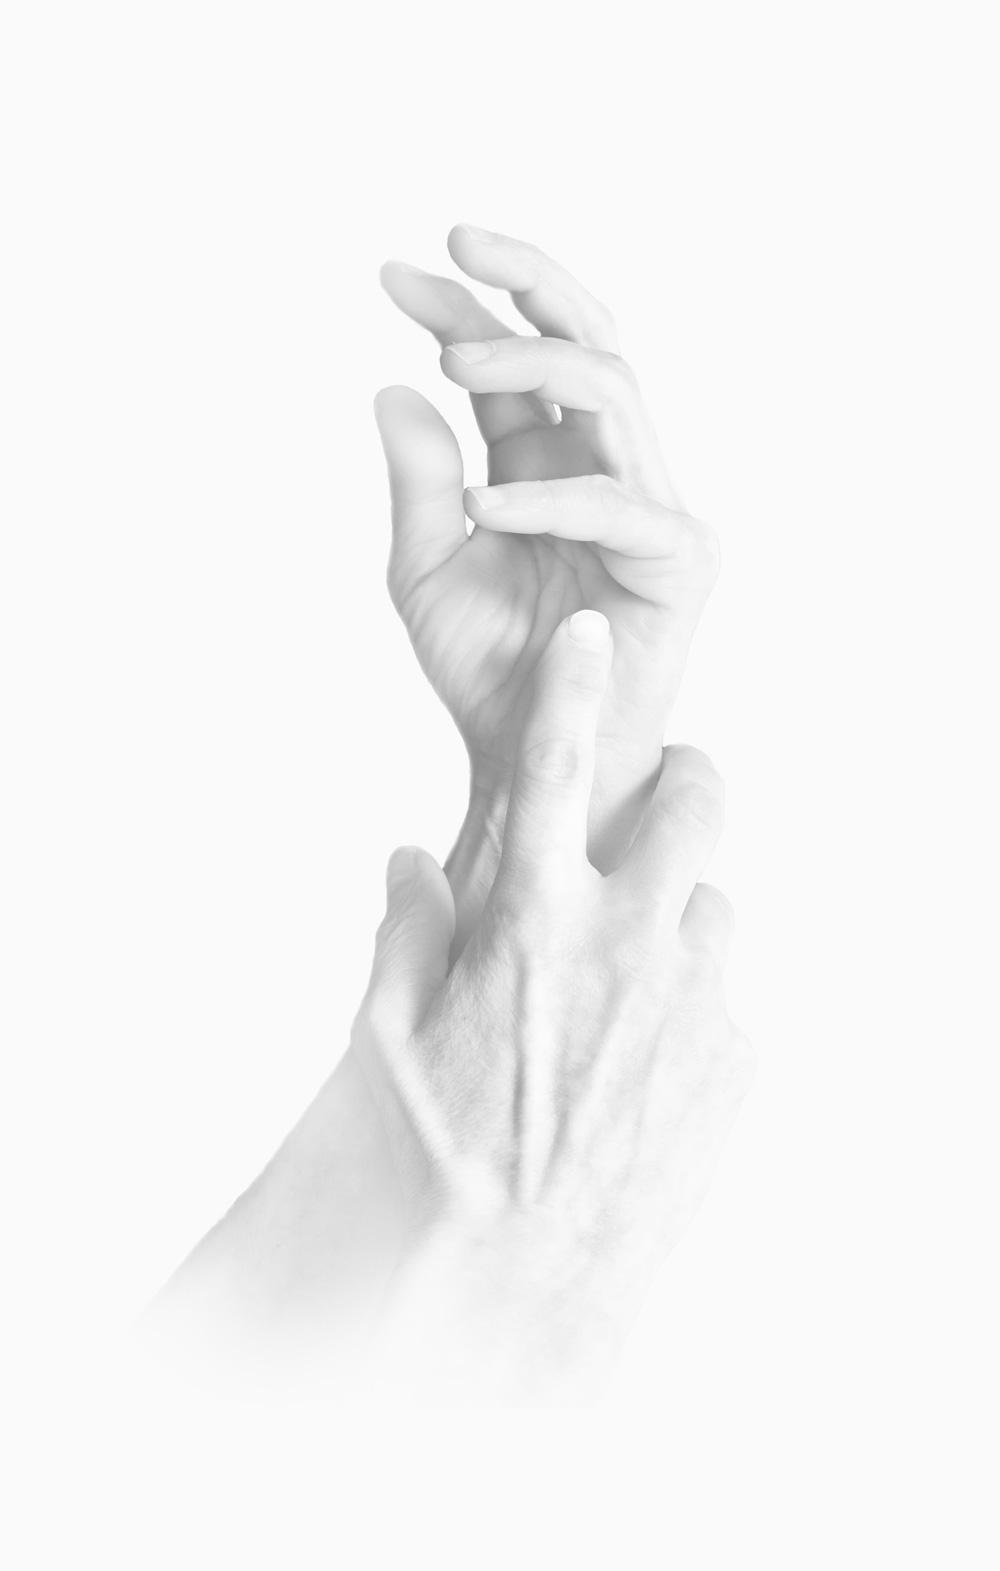 ©robertospotti-Hands